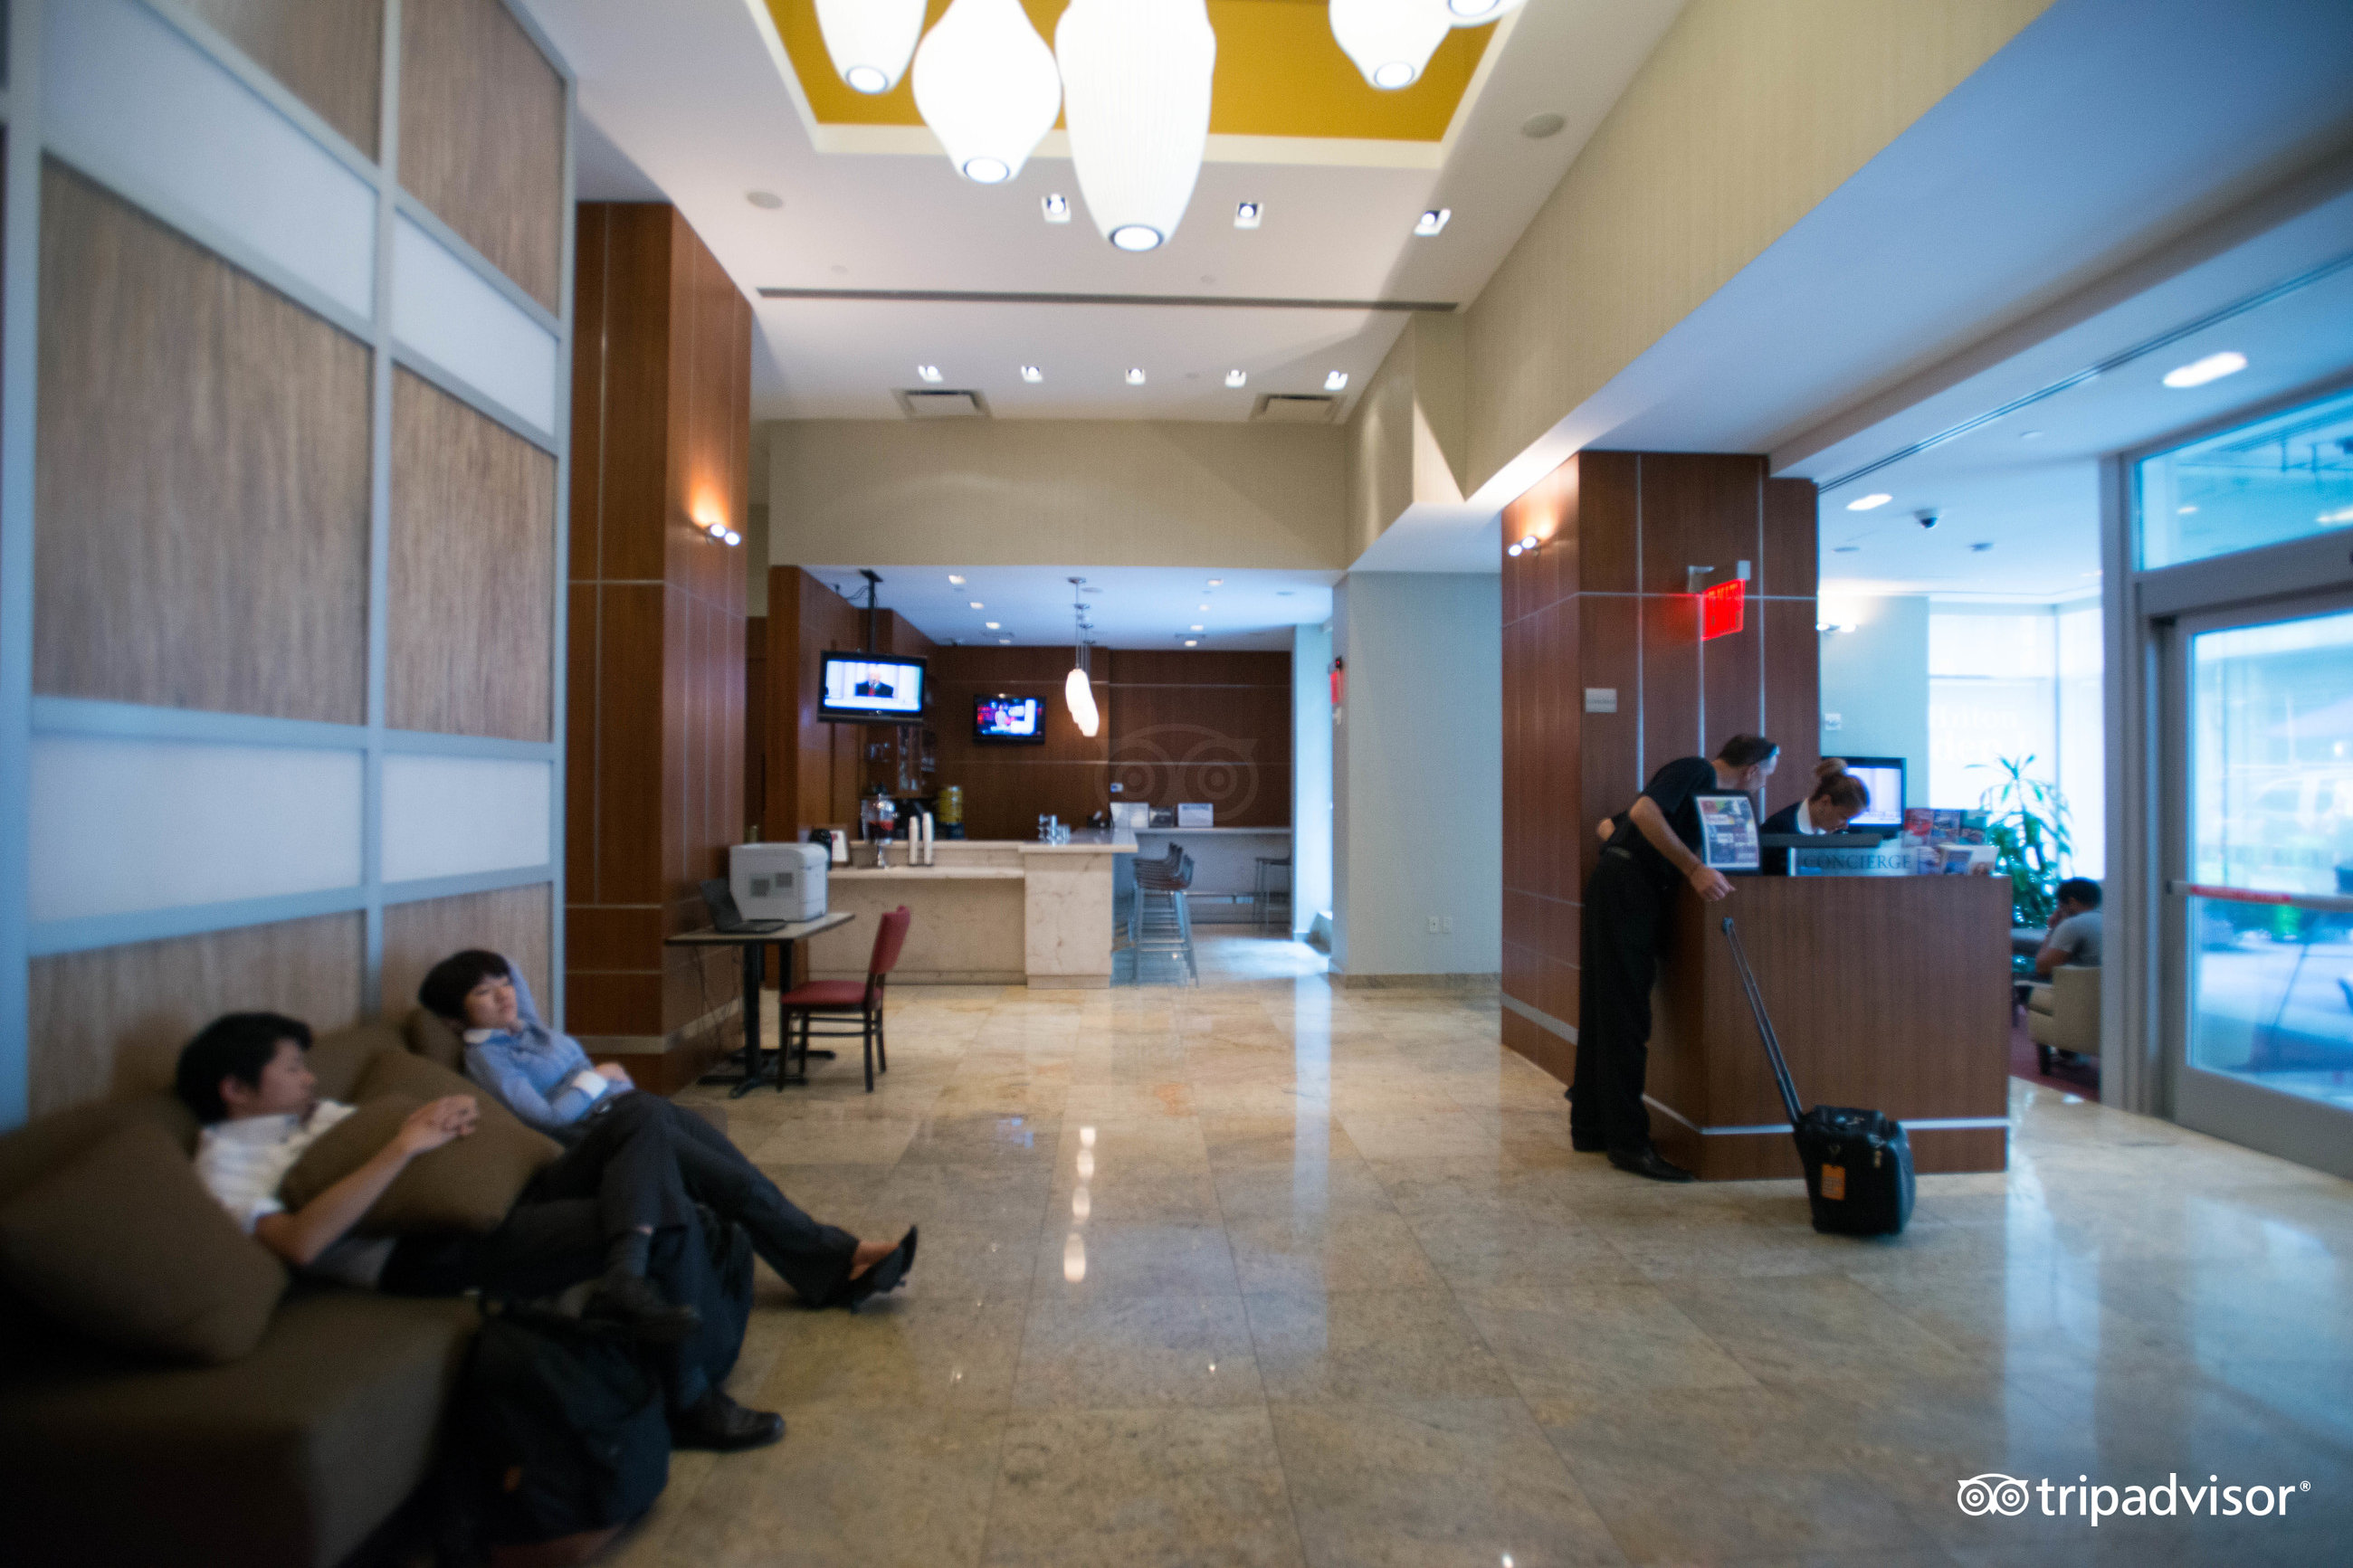 Hilton Garden Inn New York West 35th Street New York City NY